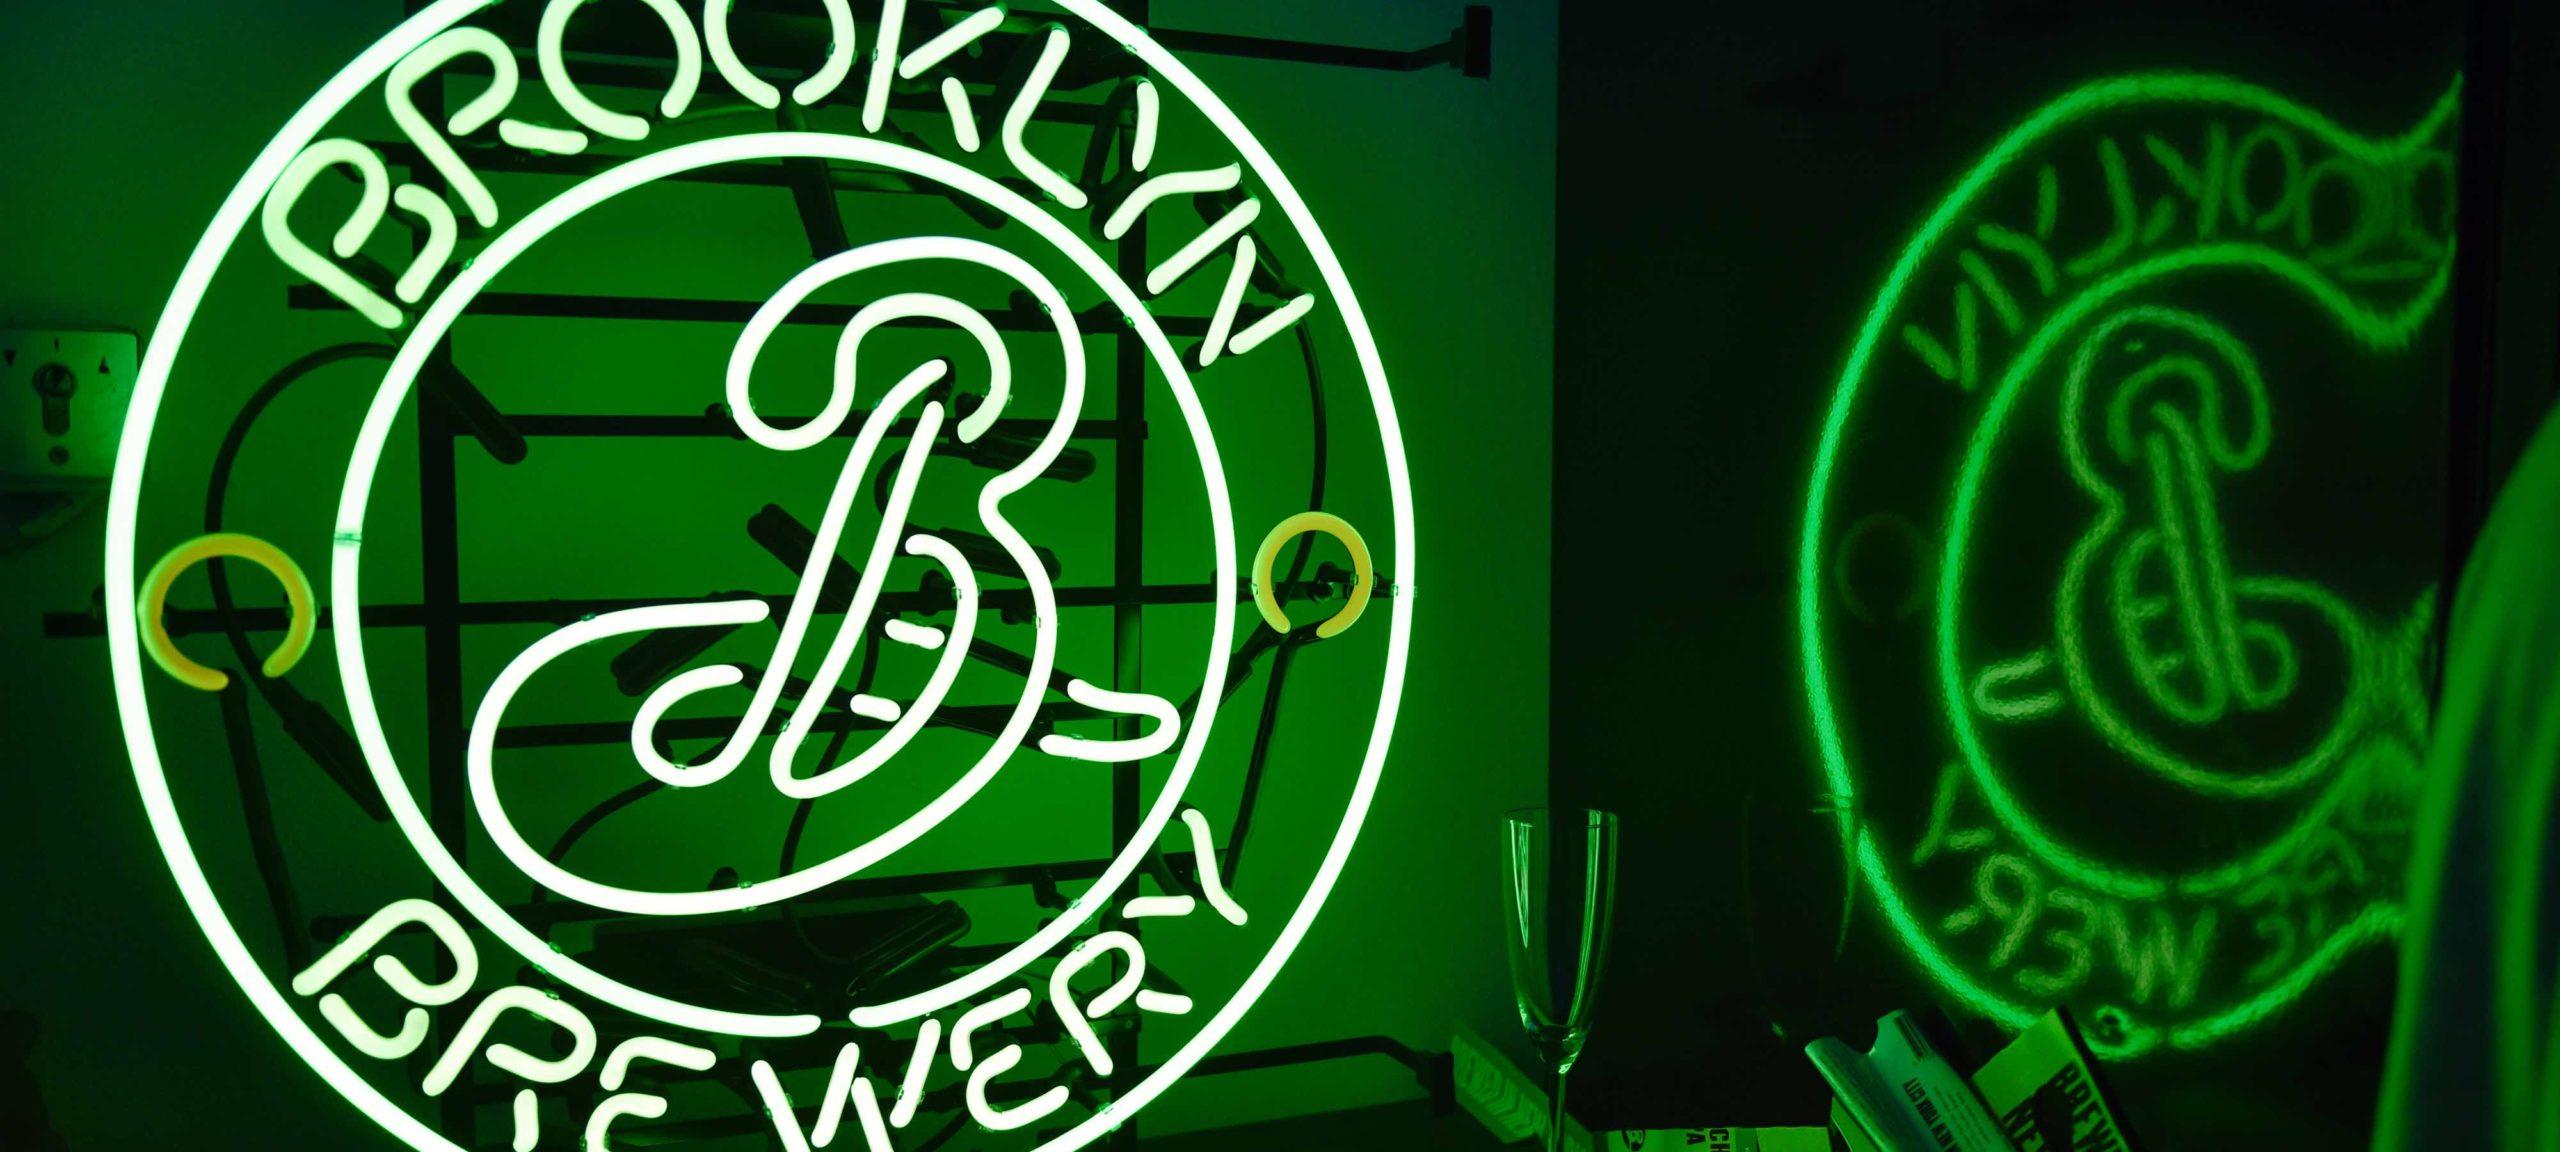 Leuchtreklame Brooklyn Brewery